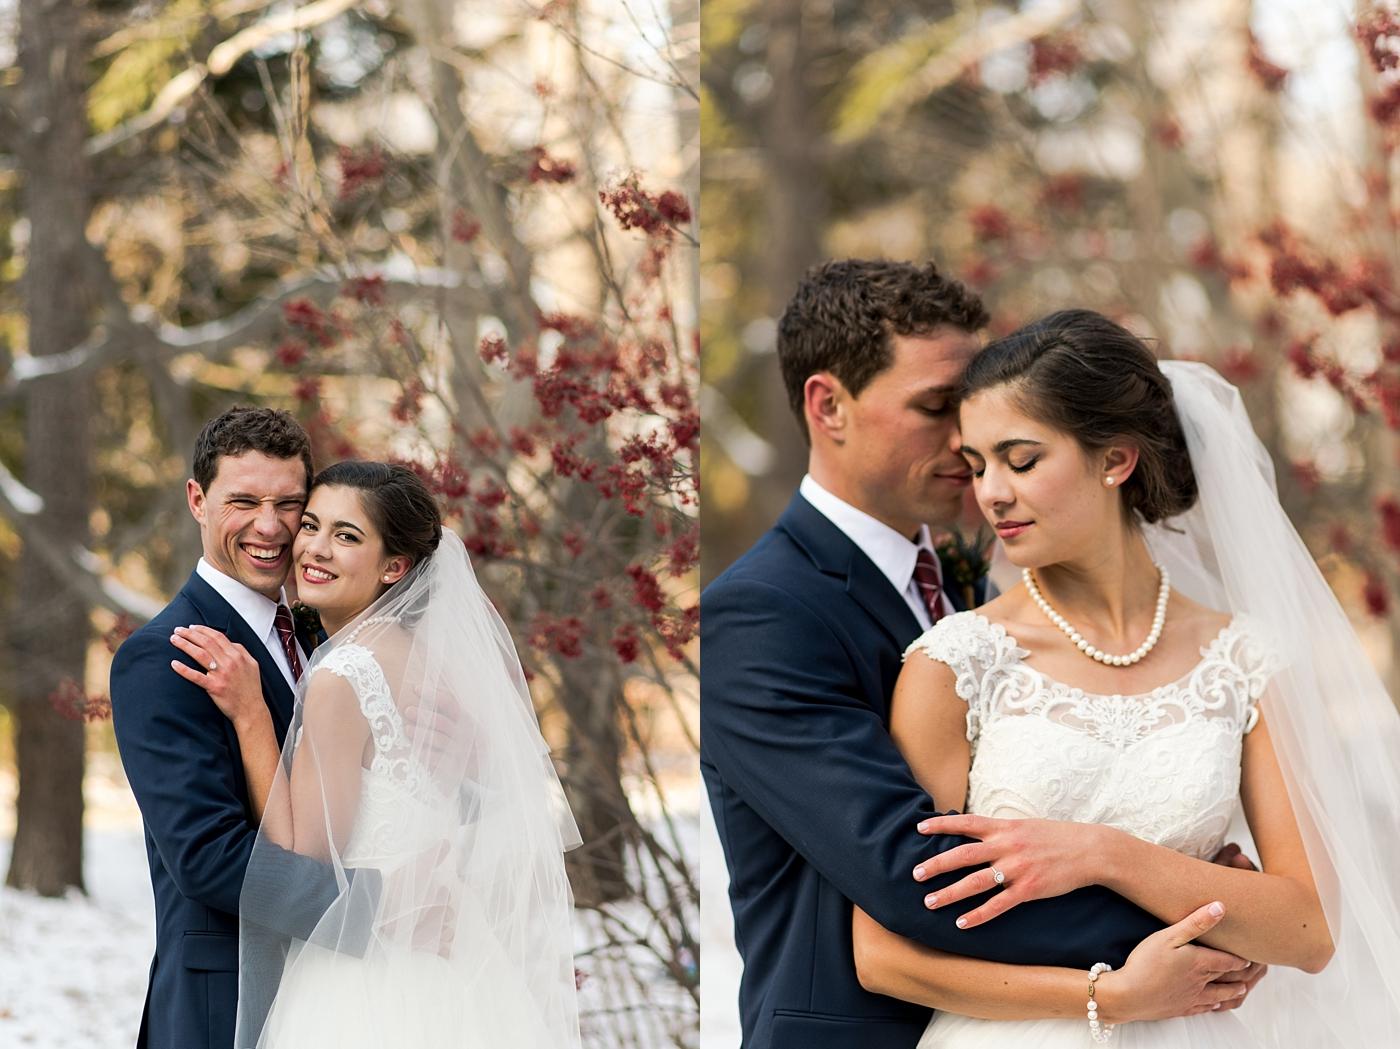 indianapolis-top-rated-wedding-photographers_0442.jpg